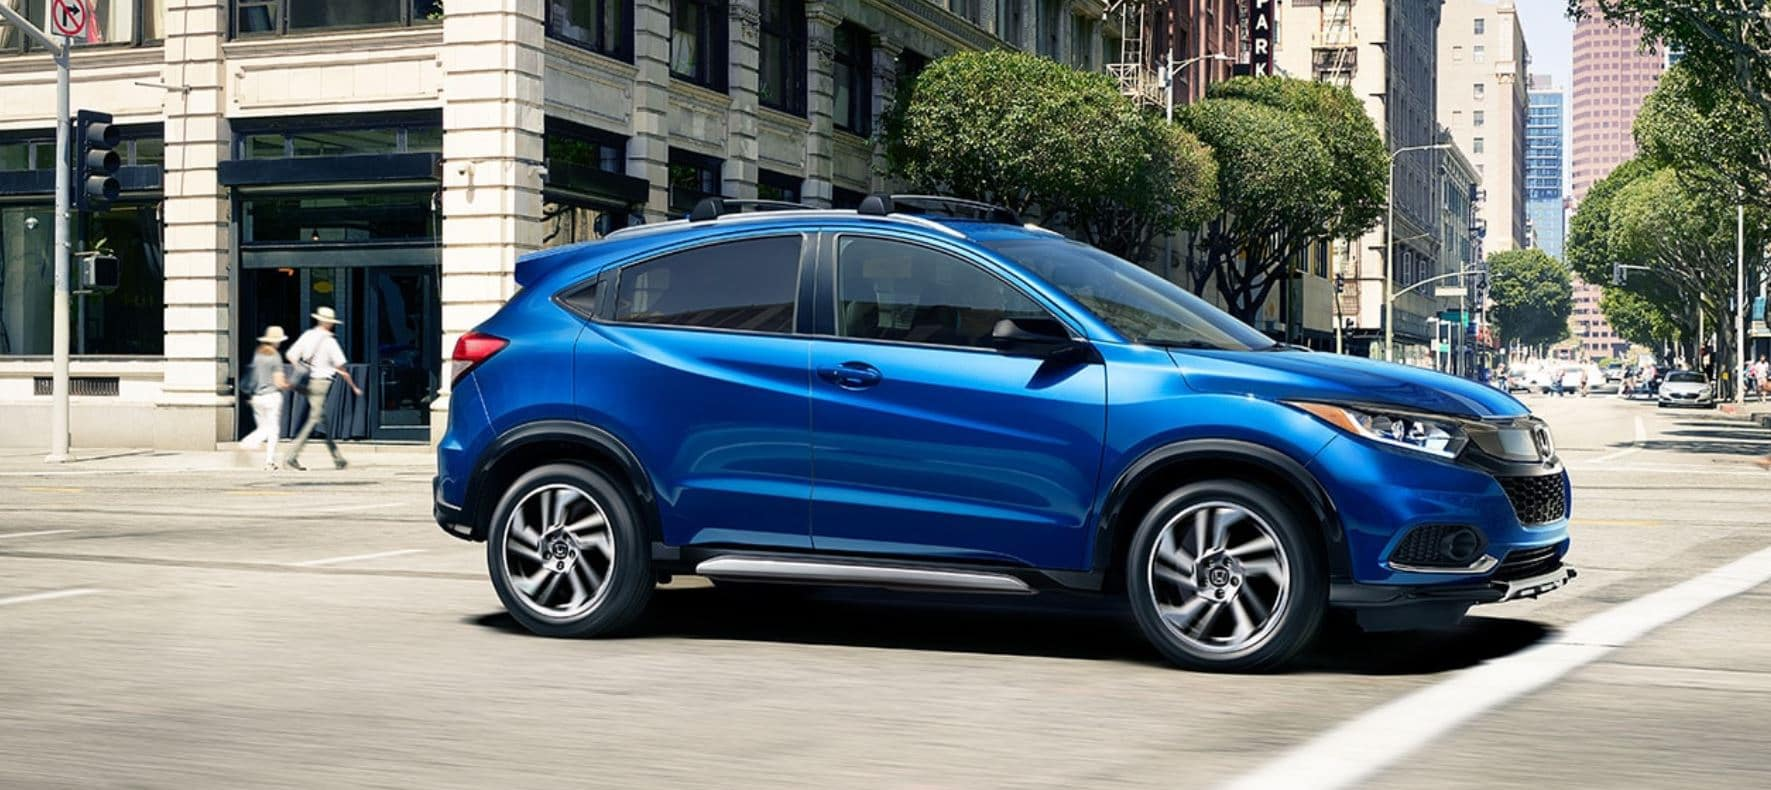 Buy, Lease, or Finance the 2020 Honda HR-V near Staten Island NY